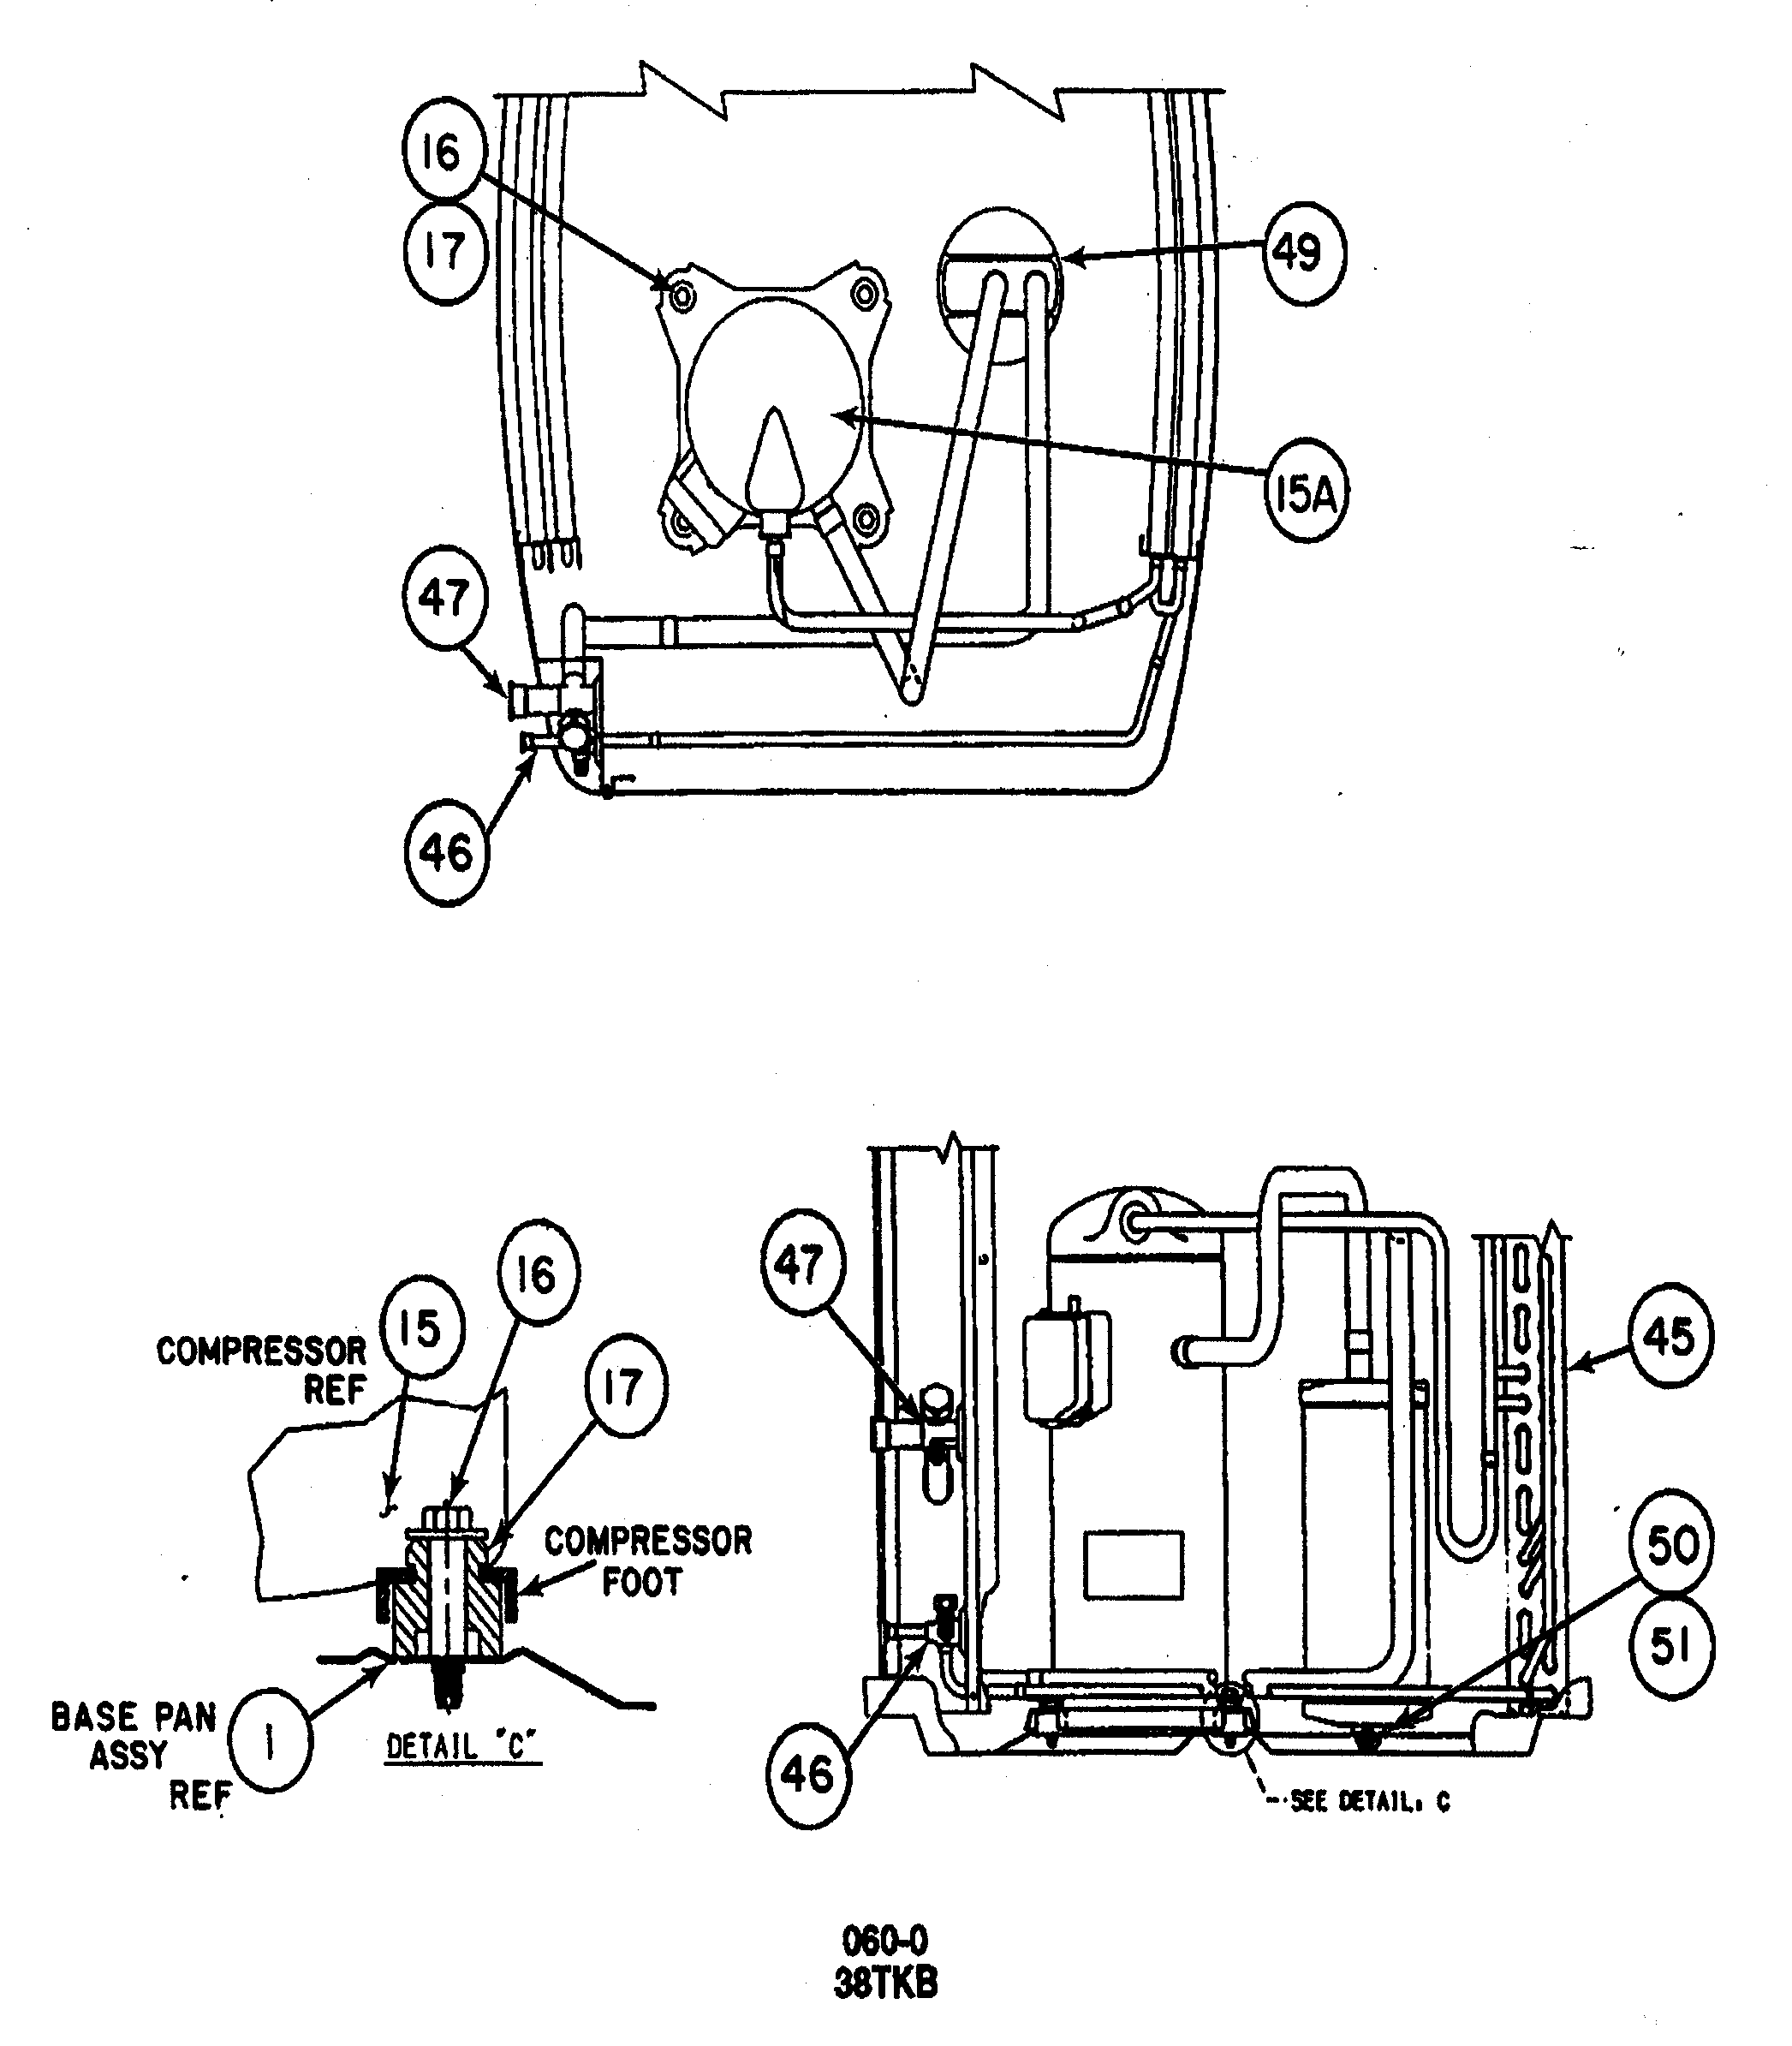 Carrier model 38TKB042 SERIES300 air-conditioner/heat pump